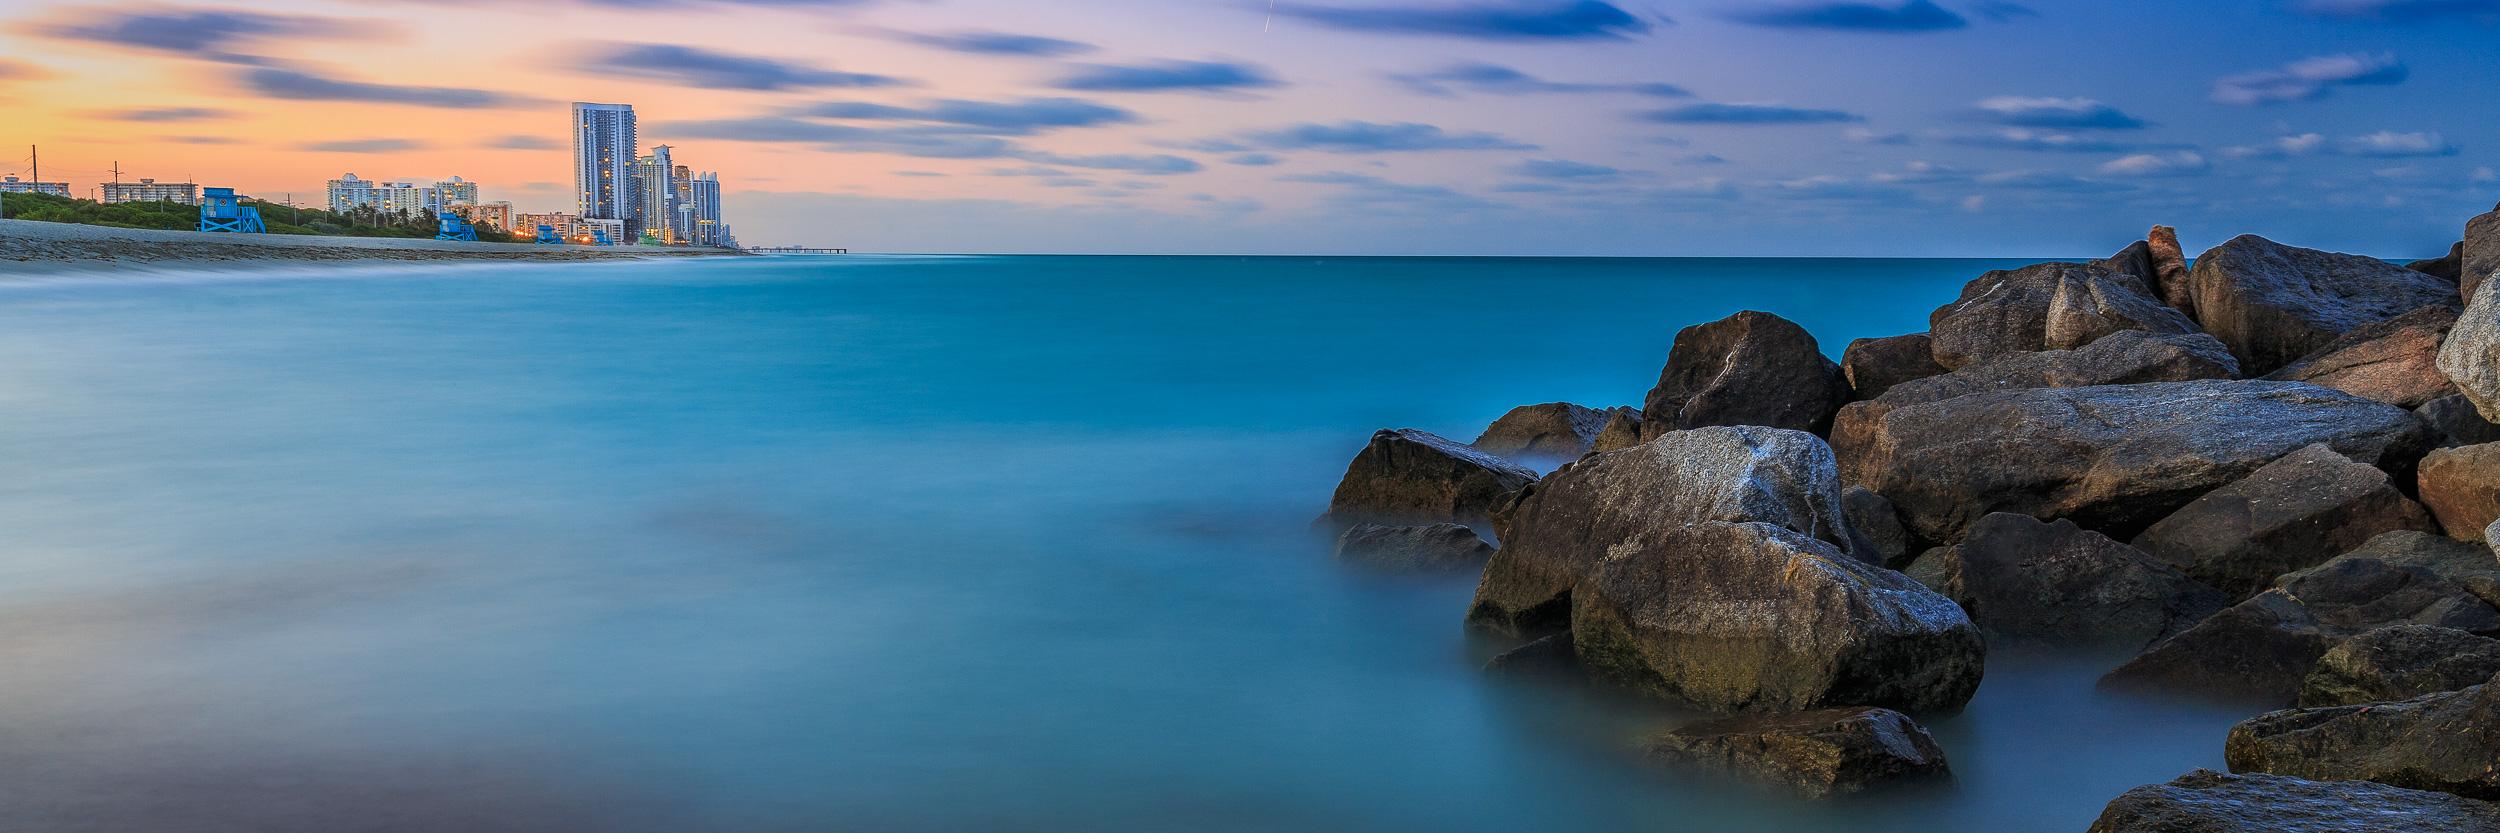 Haulover_Beach_Night_Miami_Fort_Lauderdale_commercial_photographer_Franklin_Castillo-Edit.jpg